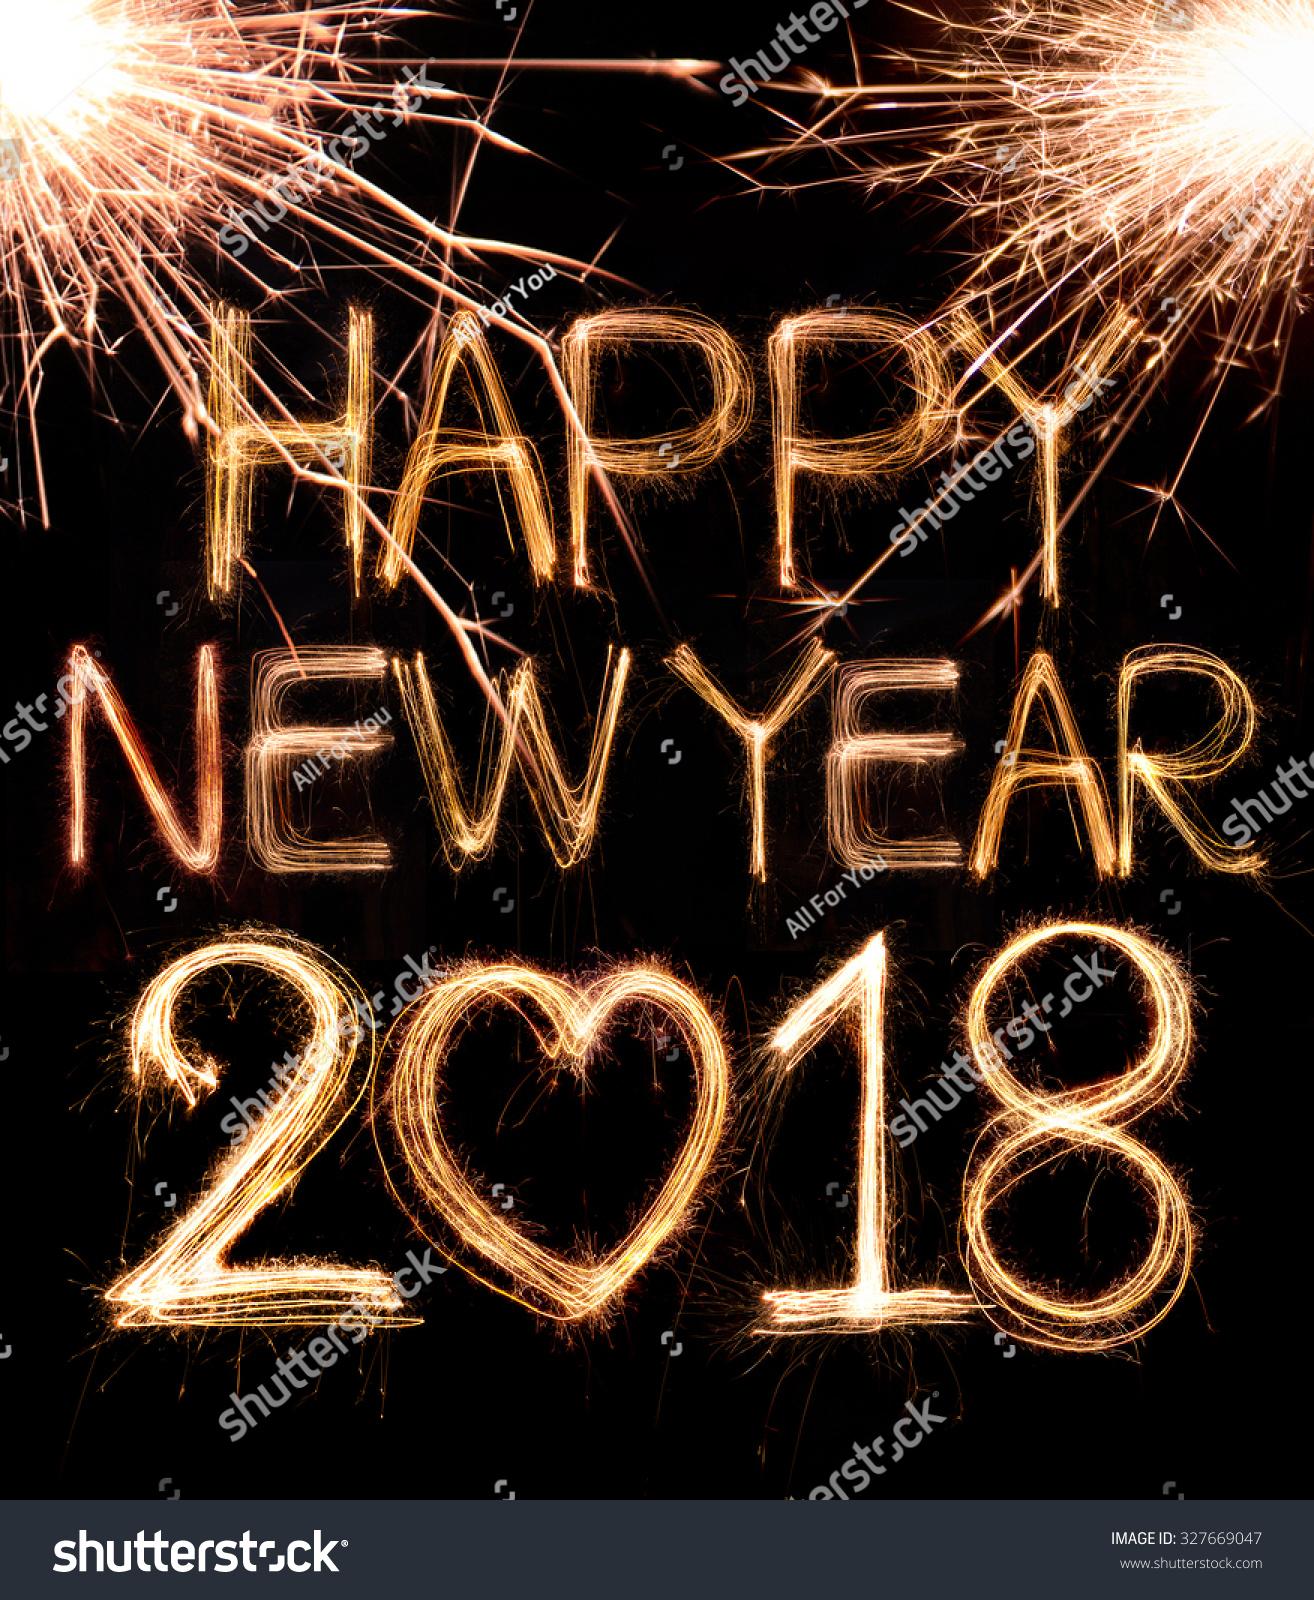 Royalty-free Happy new year 2018 written with… #327669047 Stock Photo  Avopi...